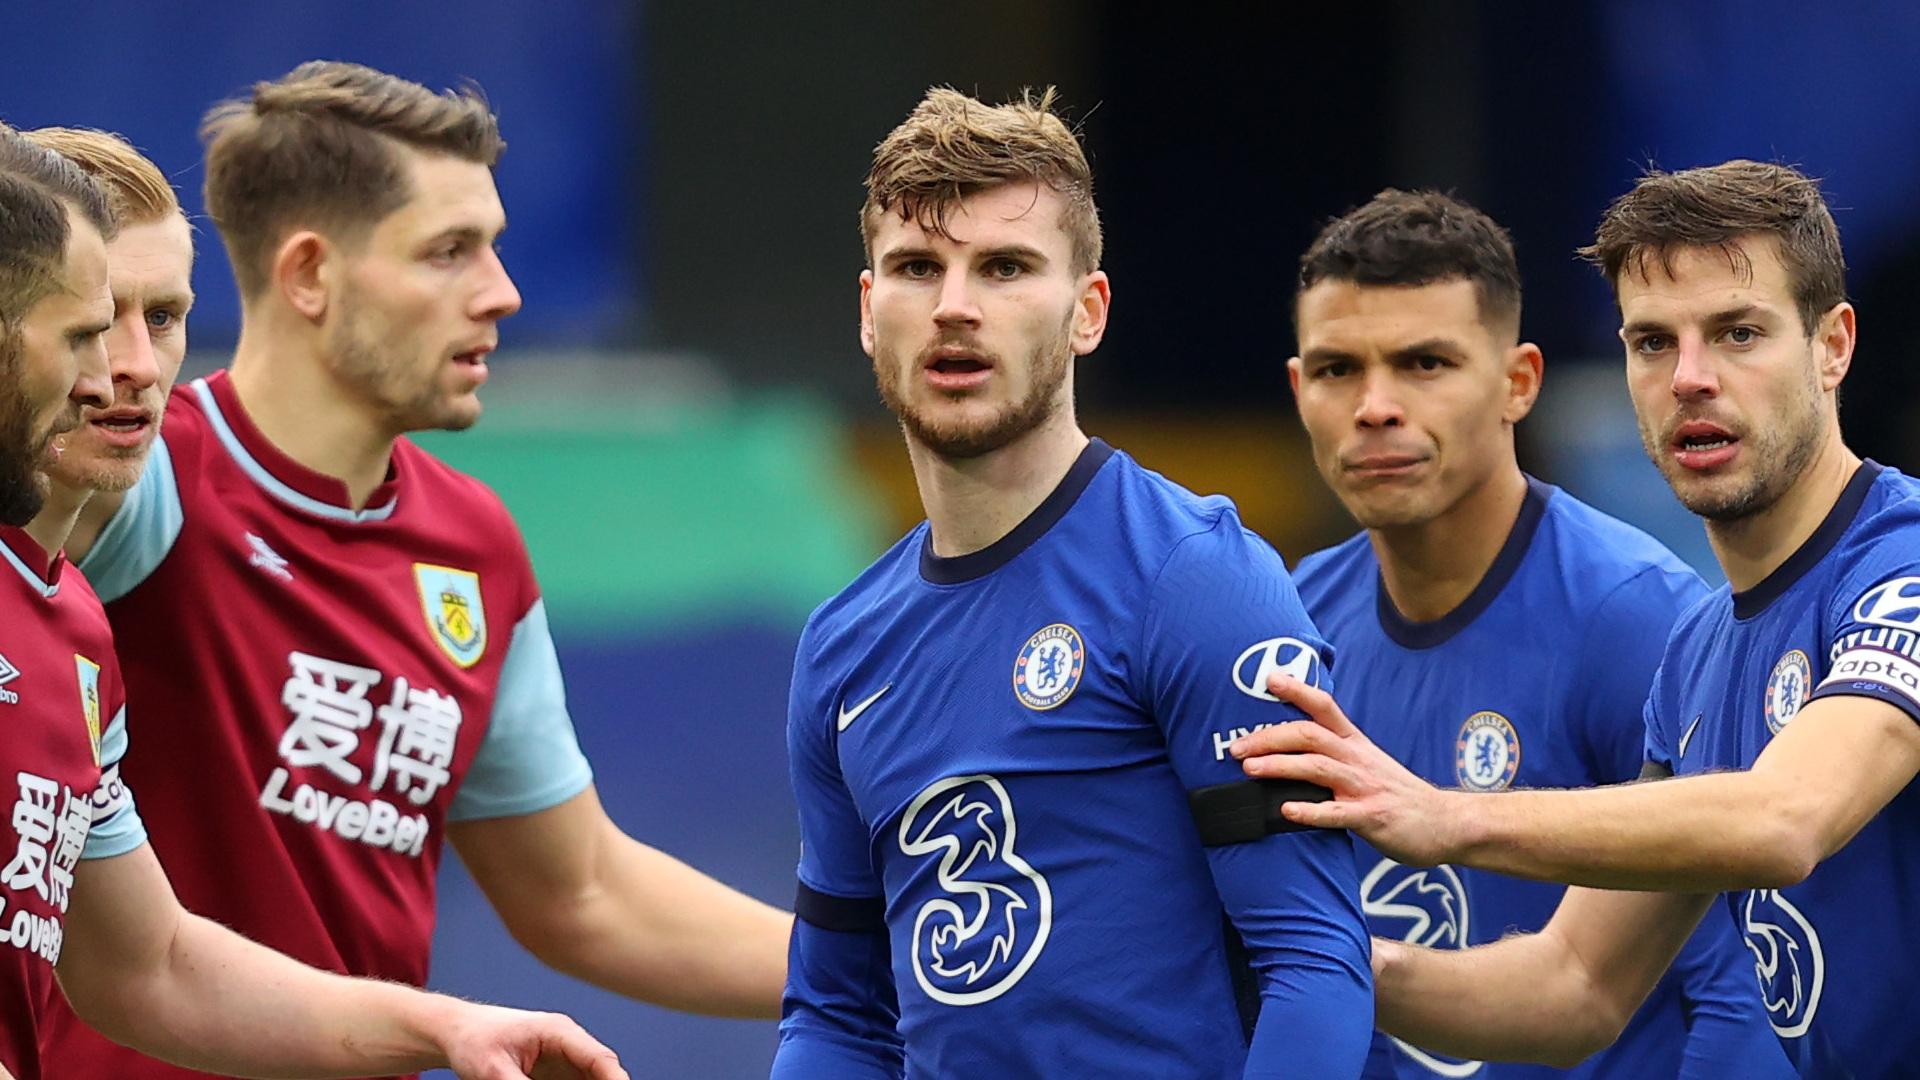 Chelsea striker Werner still 'confident' despite goal drought, claims Tuchel